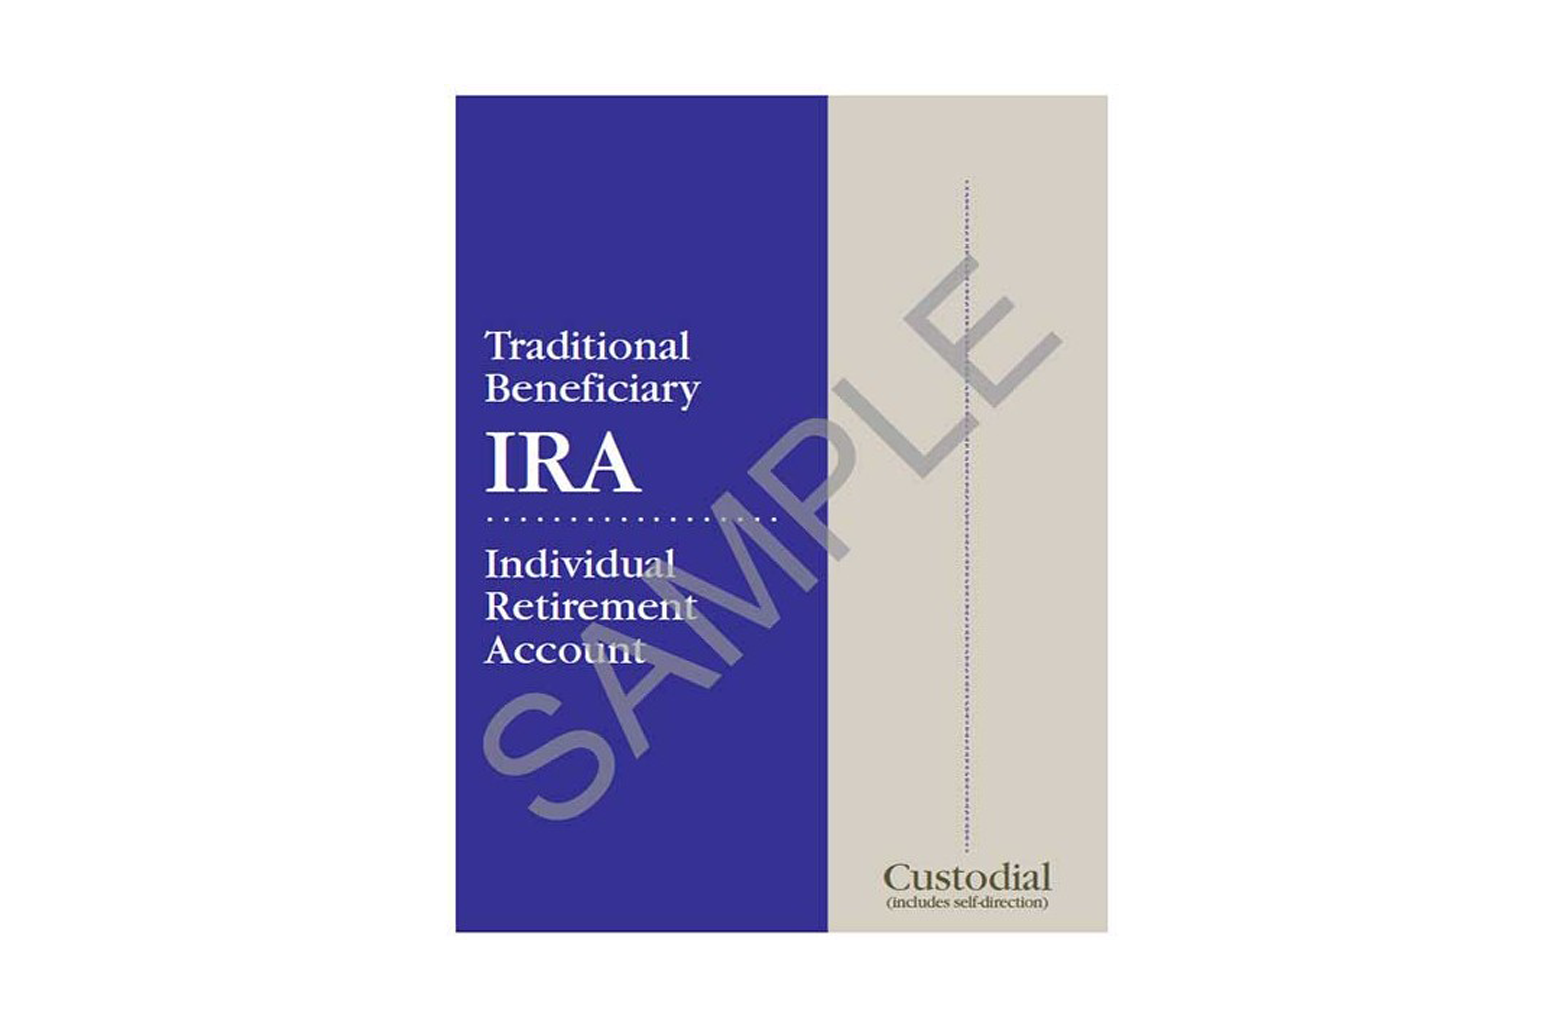 Traditional Beneficiary IRA Organizer - custodial sample